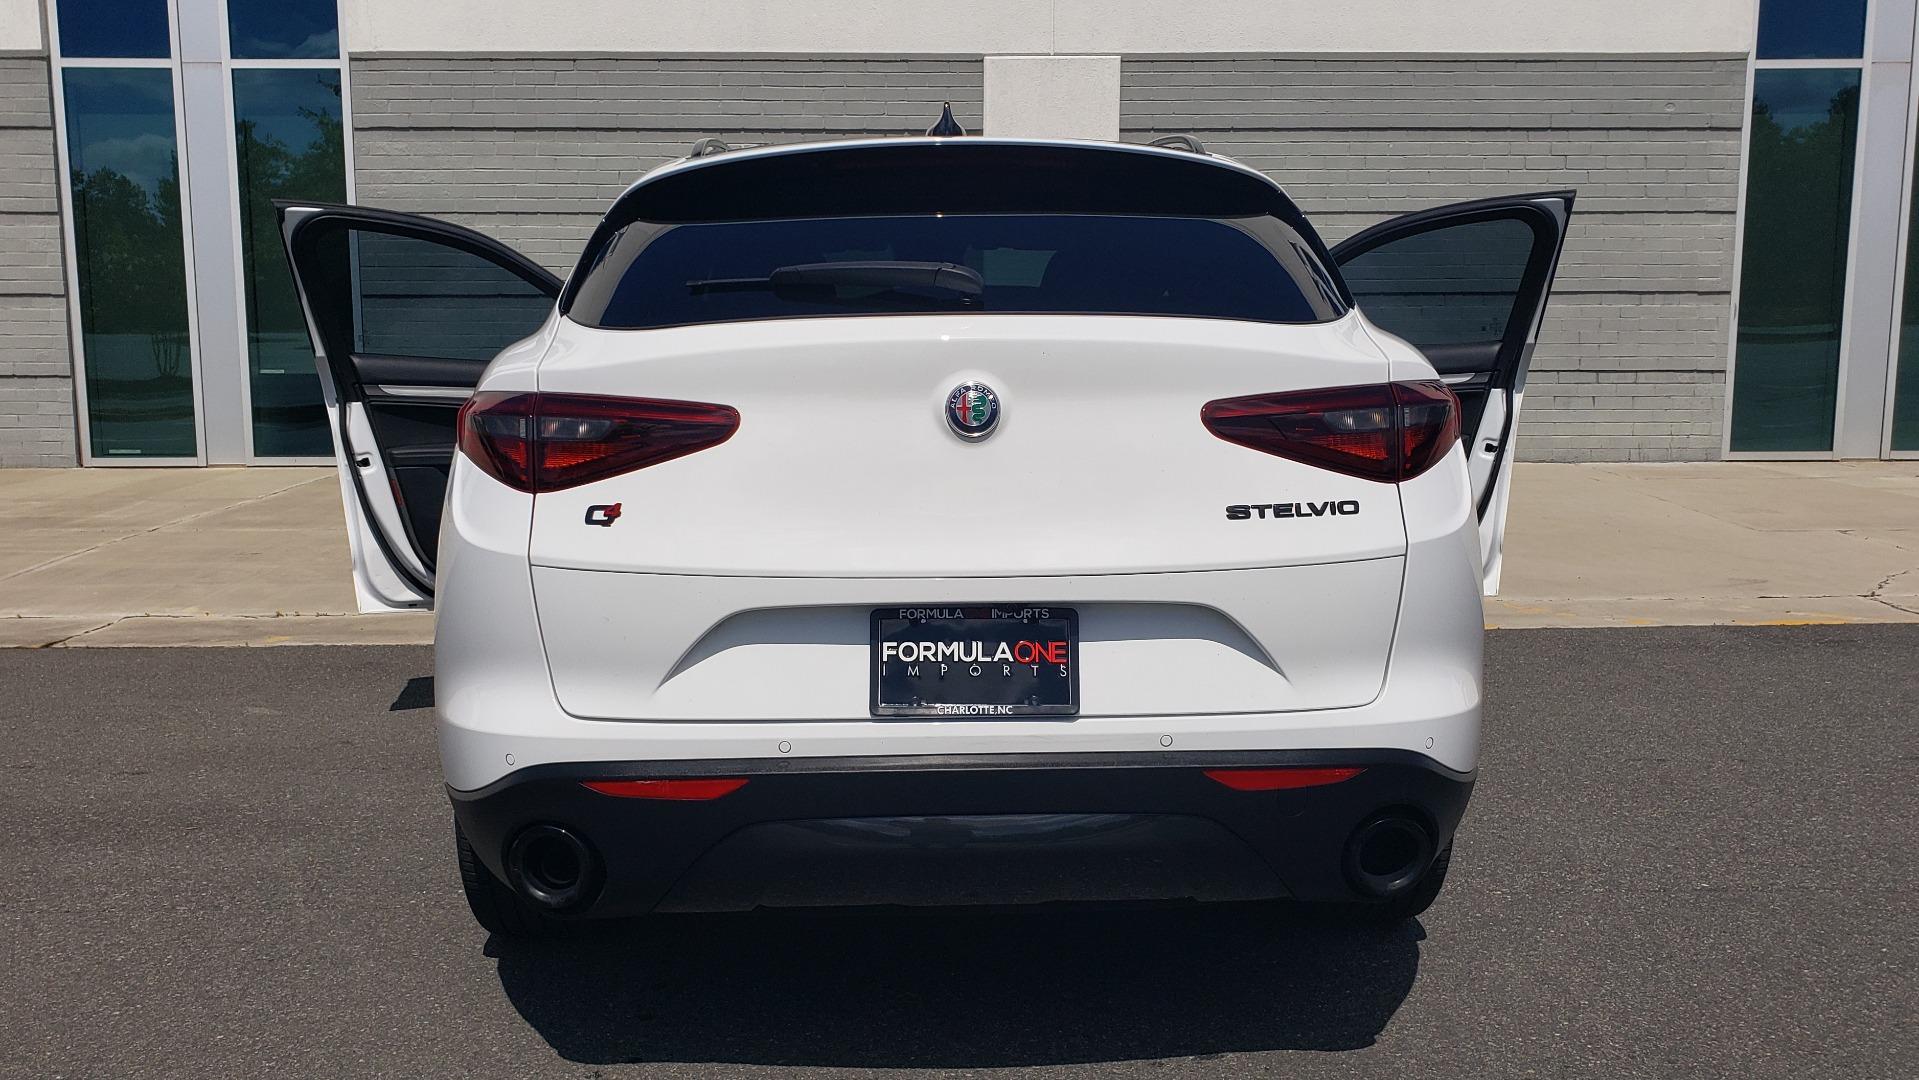 Used 2019 Alfa Romeo STELVIO TI SPORT AWD / 2.0L TURBO / 8-SPD AUTO / DRVR ASST / REARVIEW for sale $37,495 at Formula Imports in Charlotte NC 28227 32